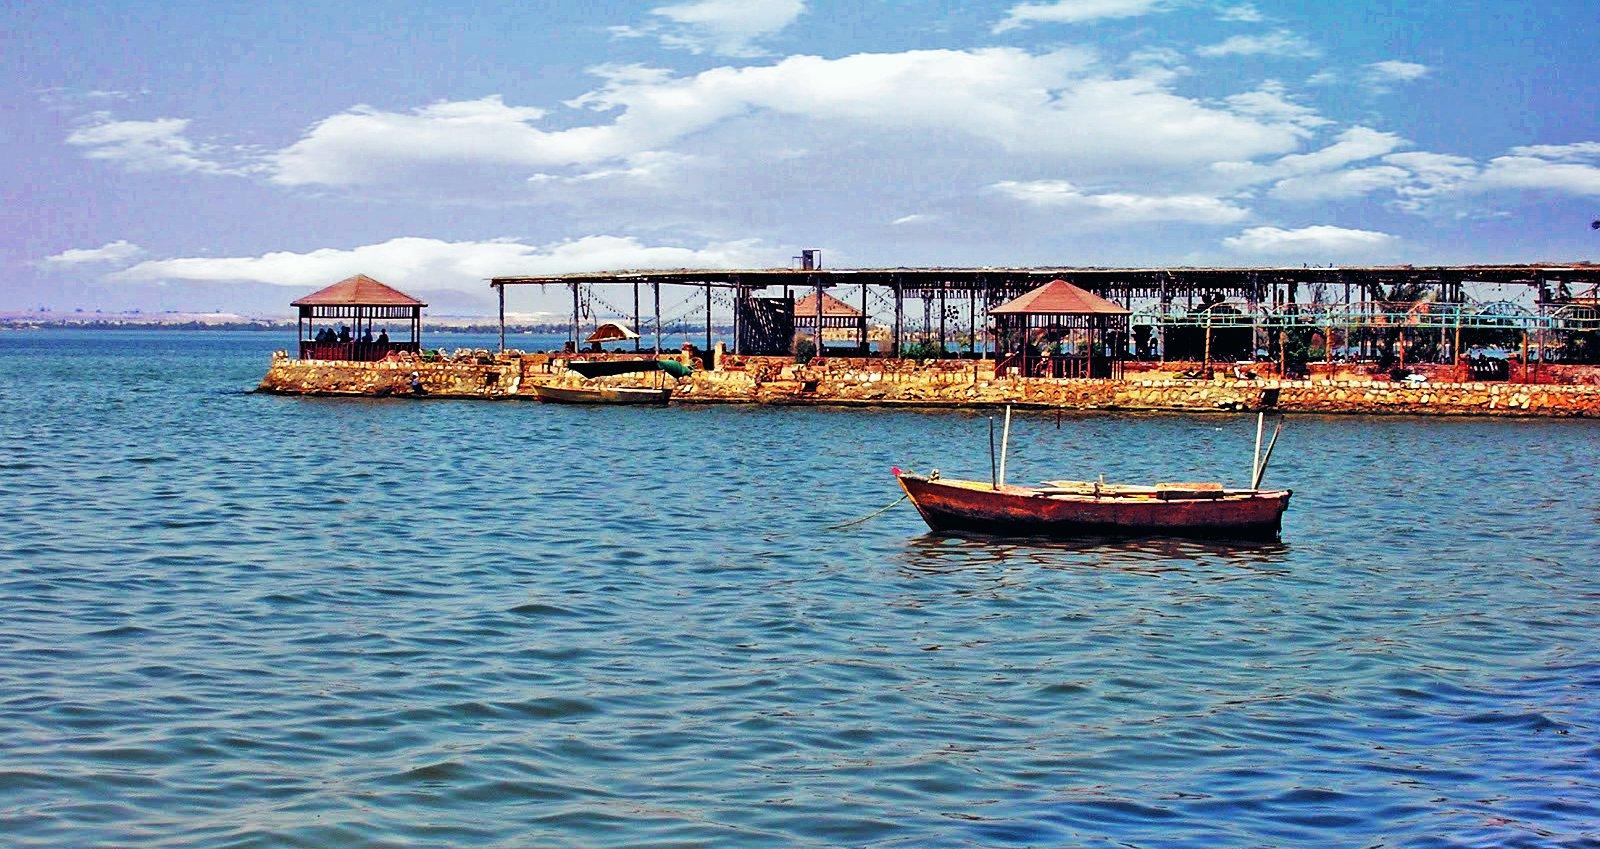 One Day Trip to El Fayoum